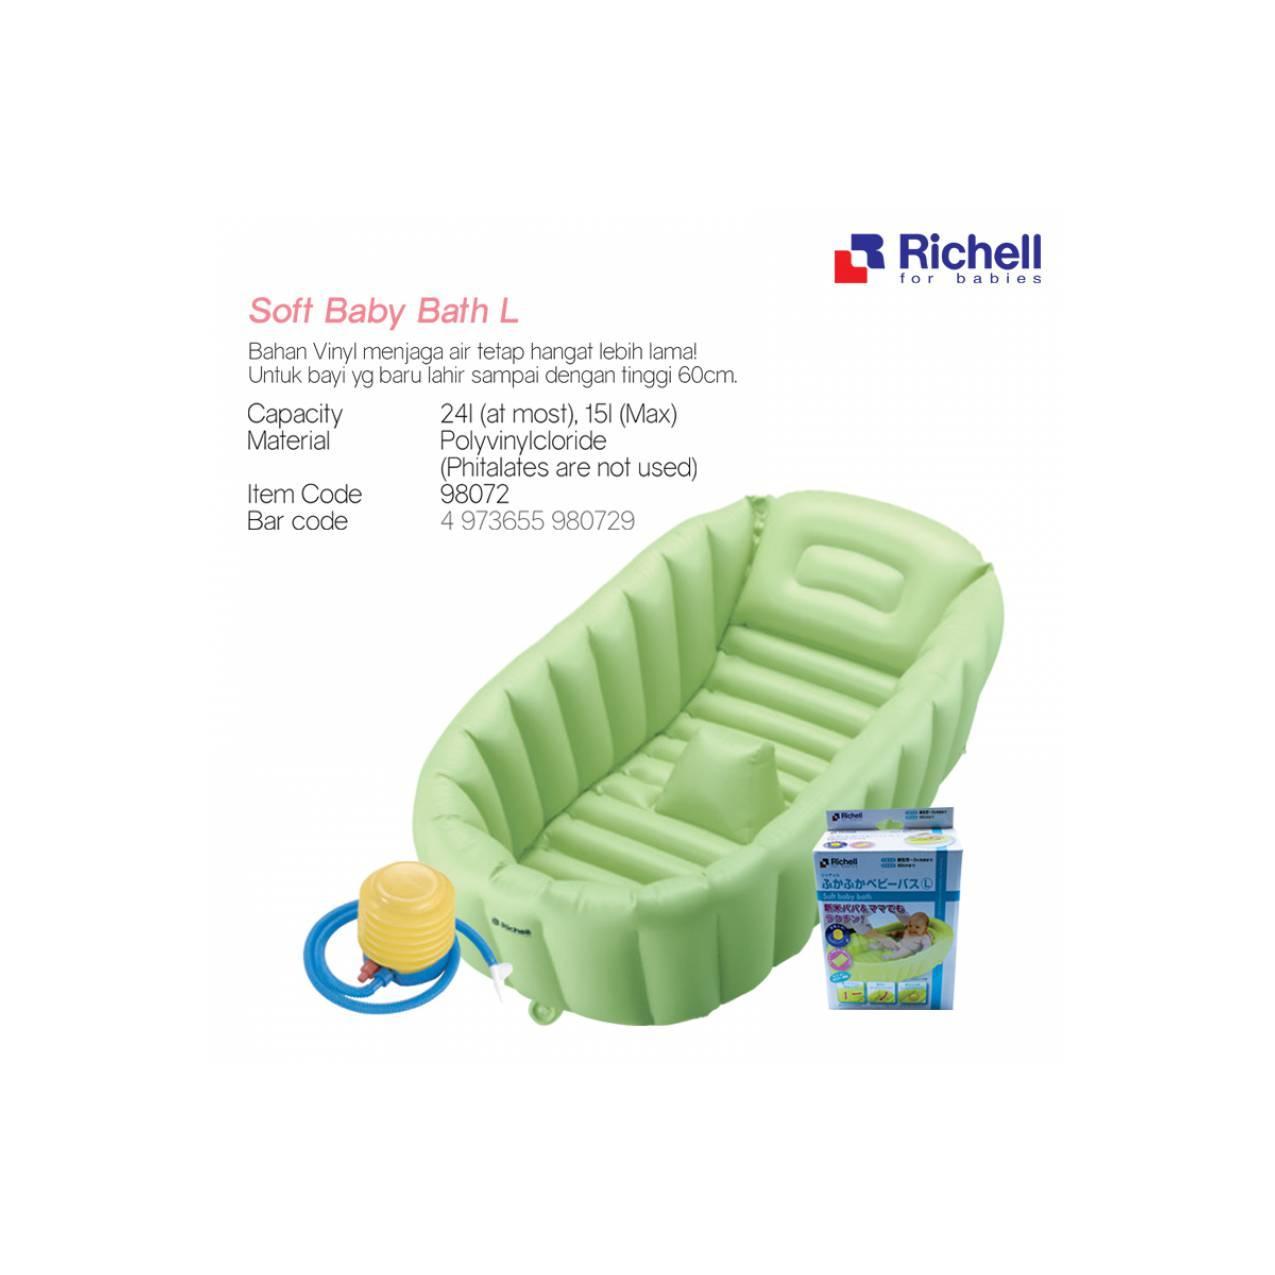 Richell Bak Mandi Bayi Soft Baby Bath L Tidak Licin Dan Original Tempat Shinpo Paradise 601 Inflatable Tub Kolam Portable